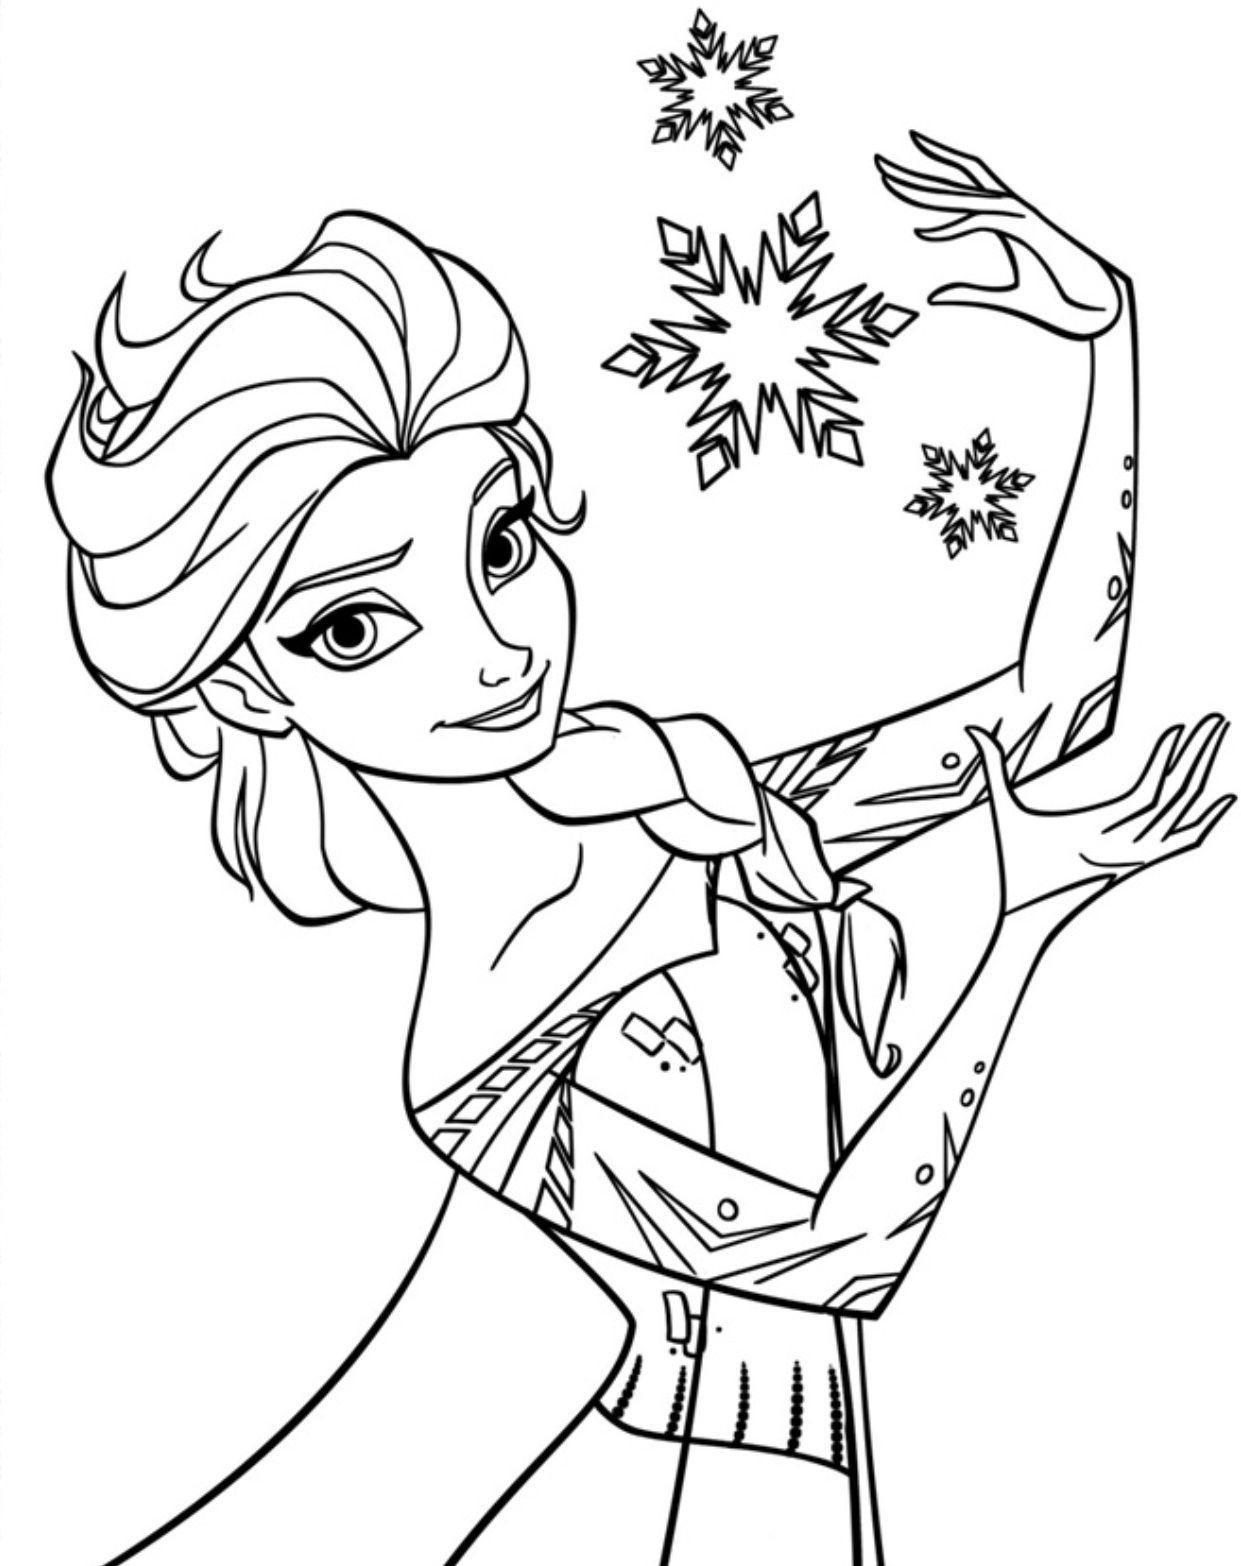 1241x1566 Frozen Coloring Pages Elsa Free Coloring Pages